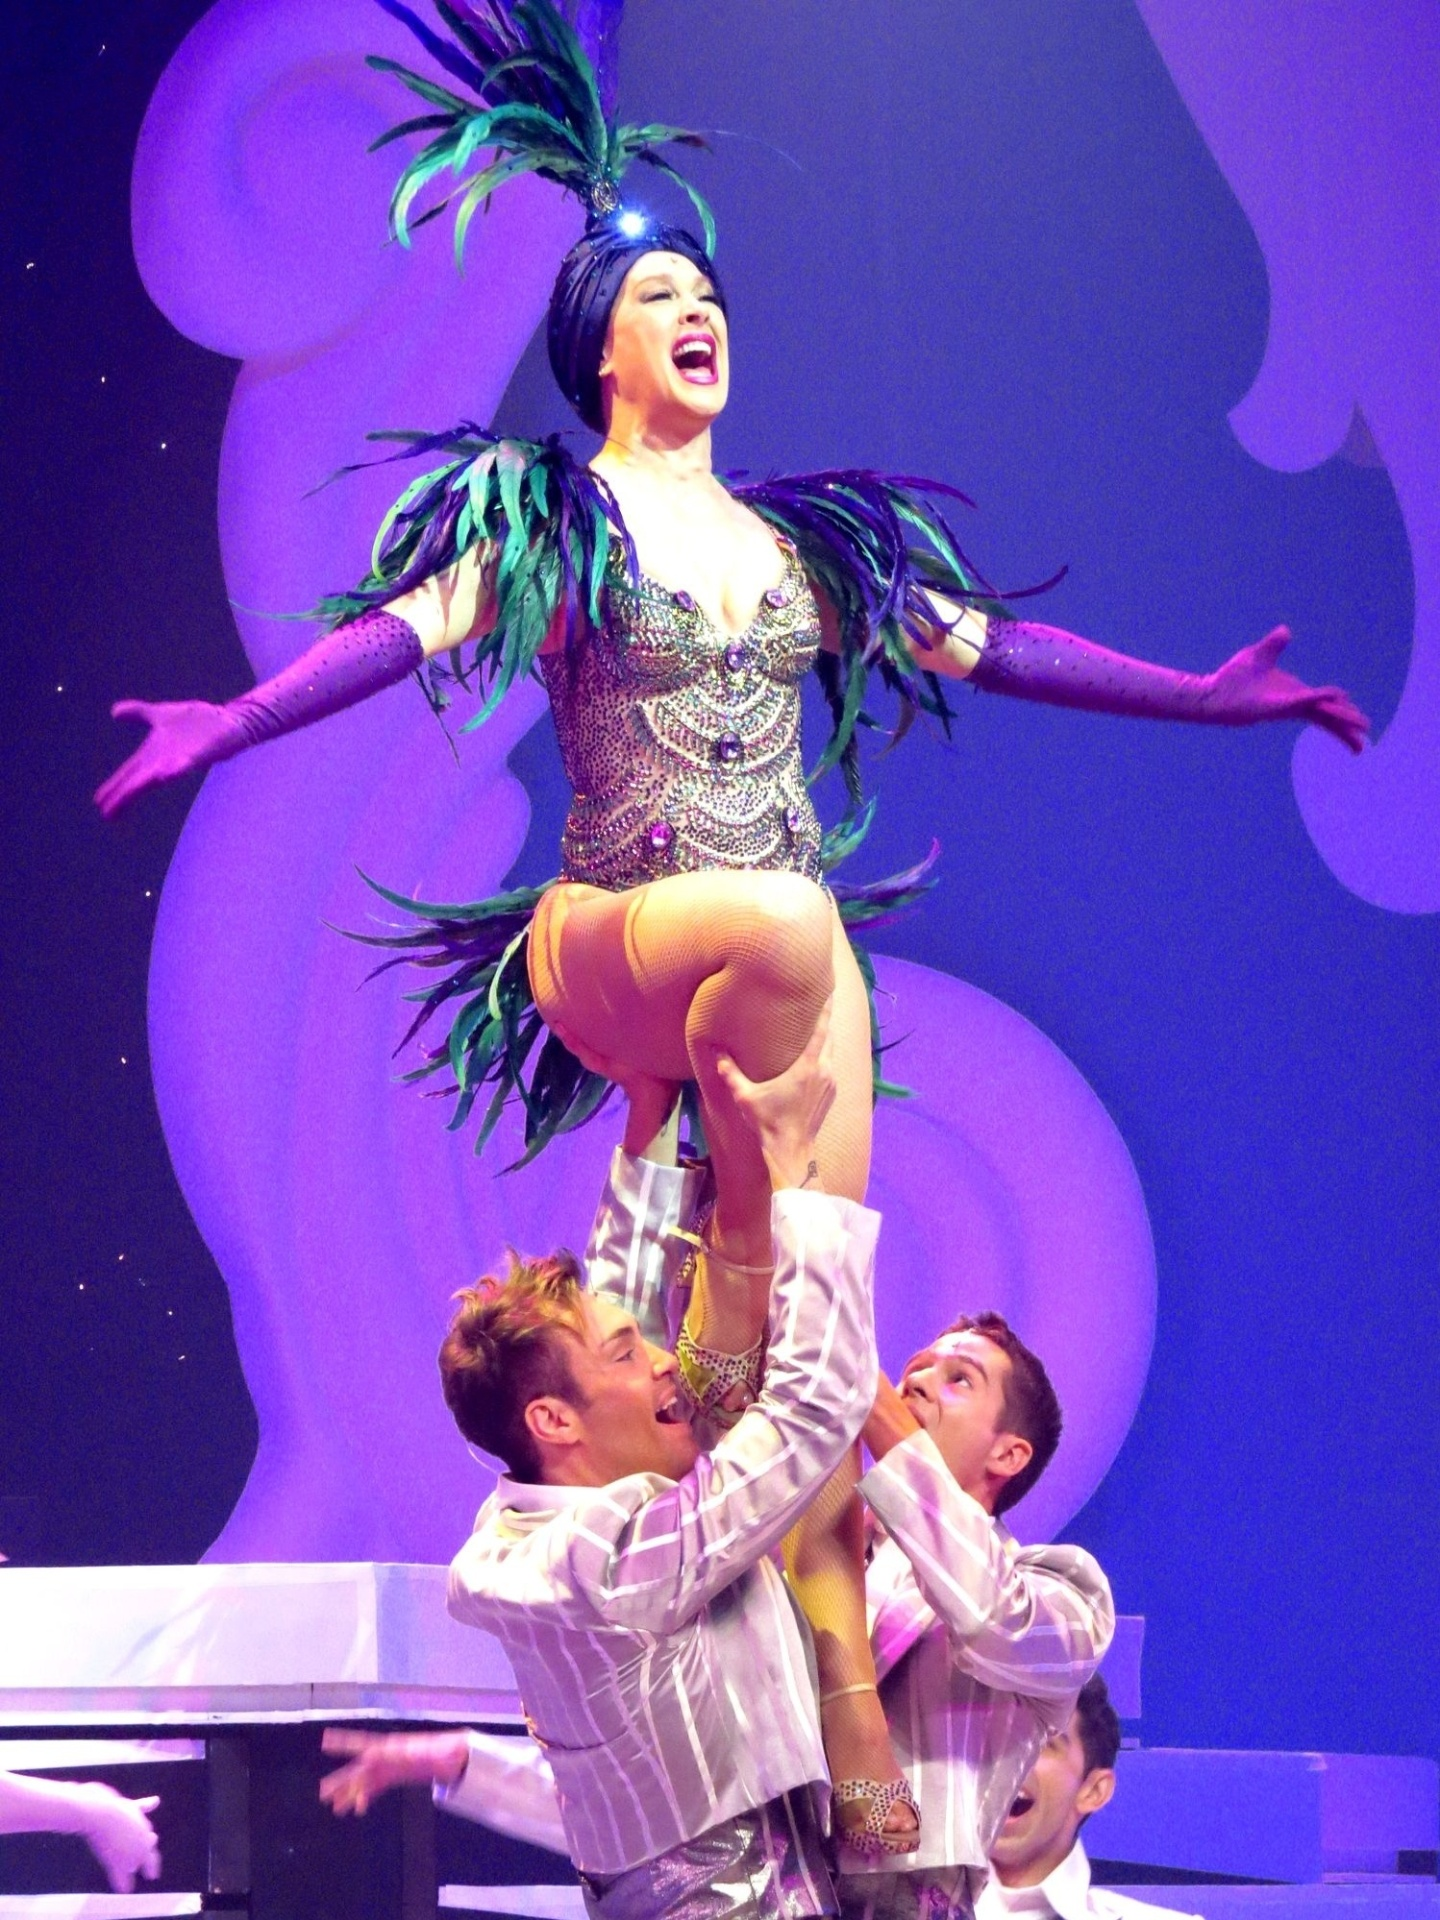 21.jul.2015 - Claudia disse que o espetáculo vai retratar os principais momentos que ela viveu no palco